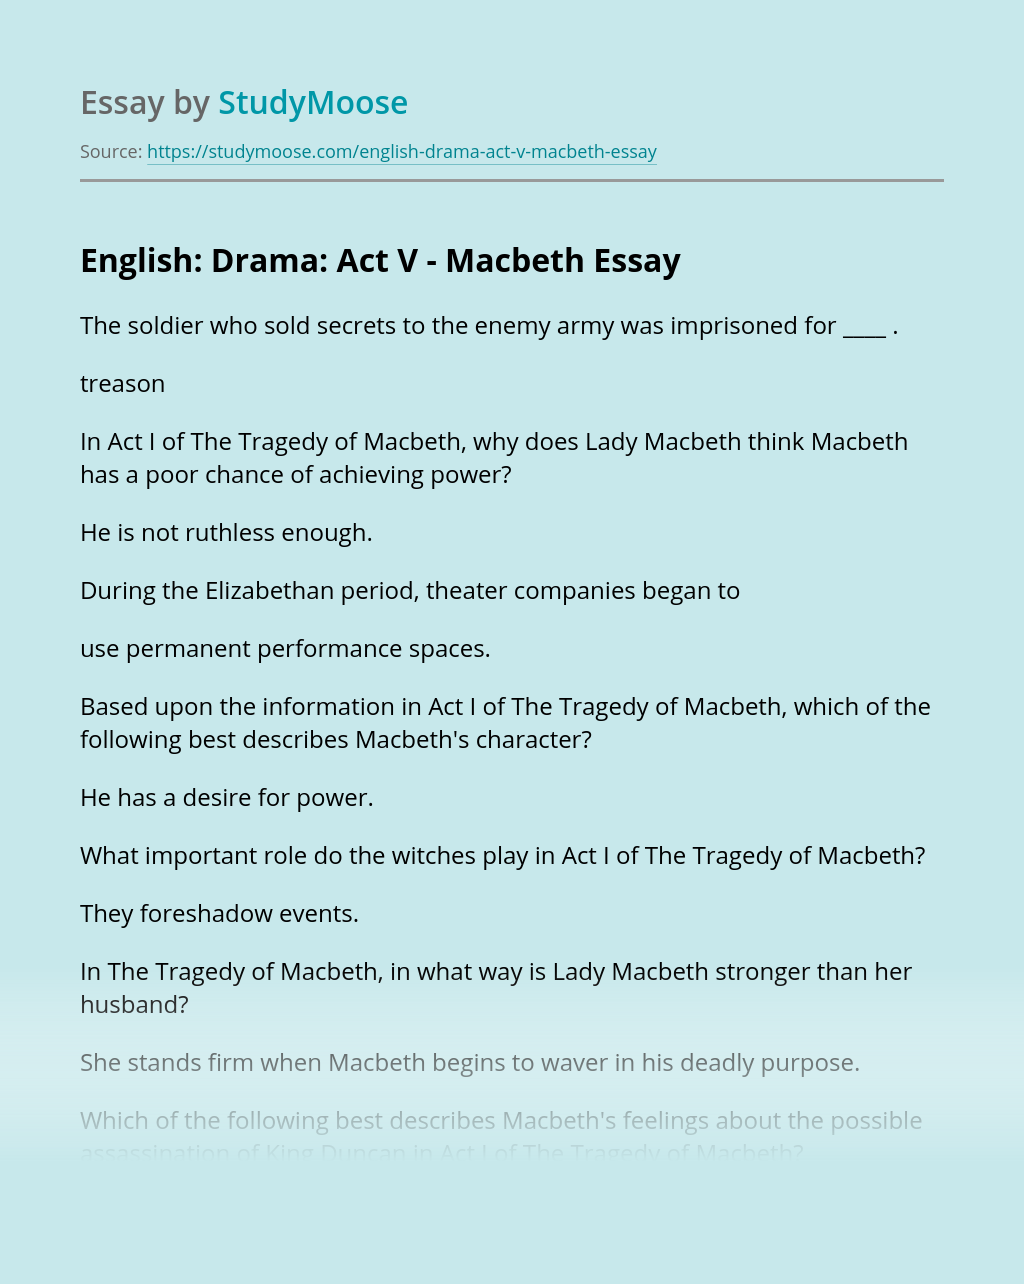 English: Drama: Act V – Macbeth